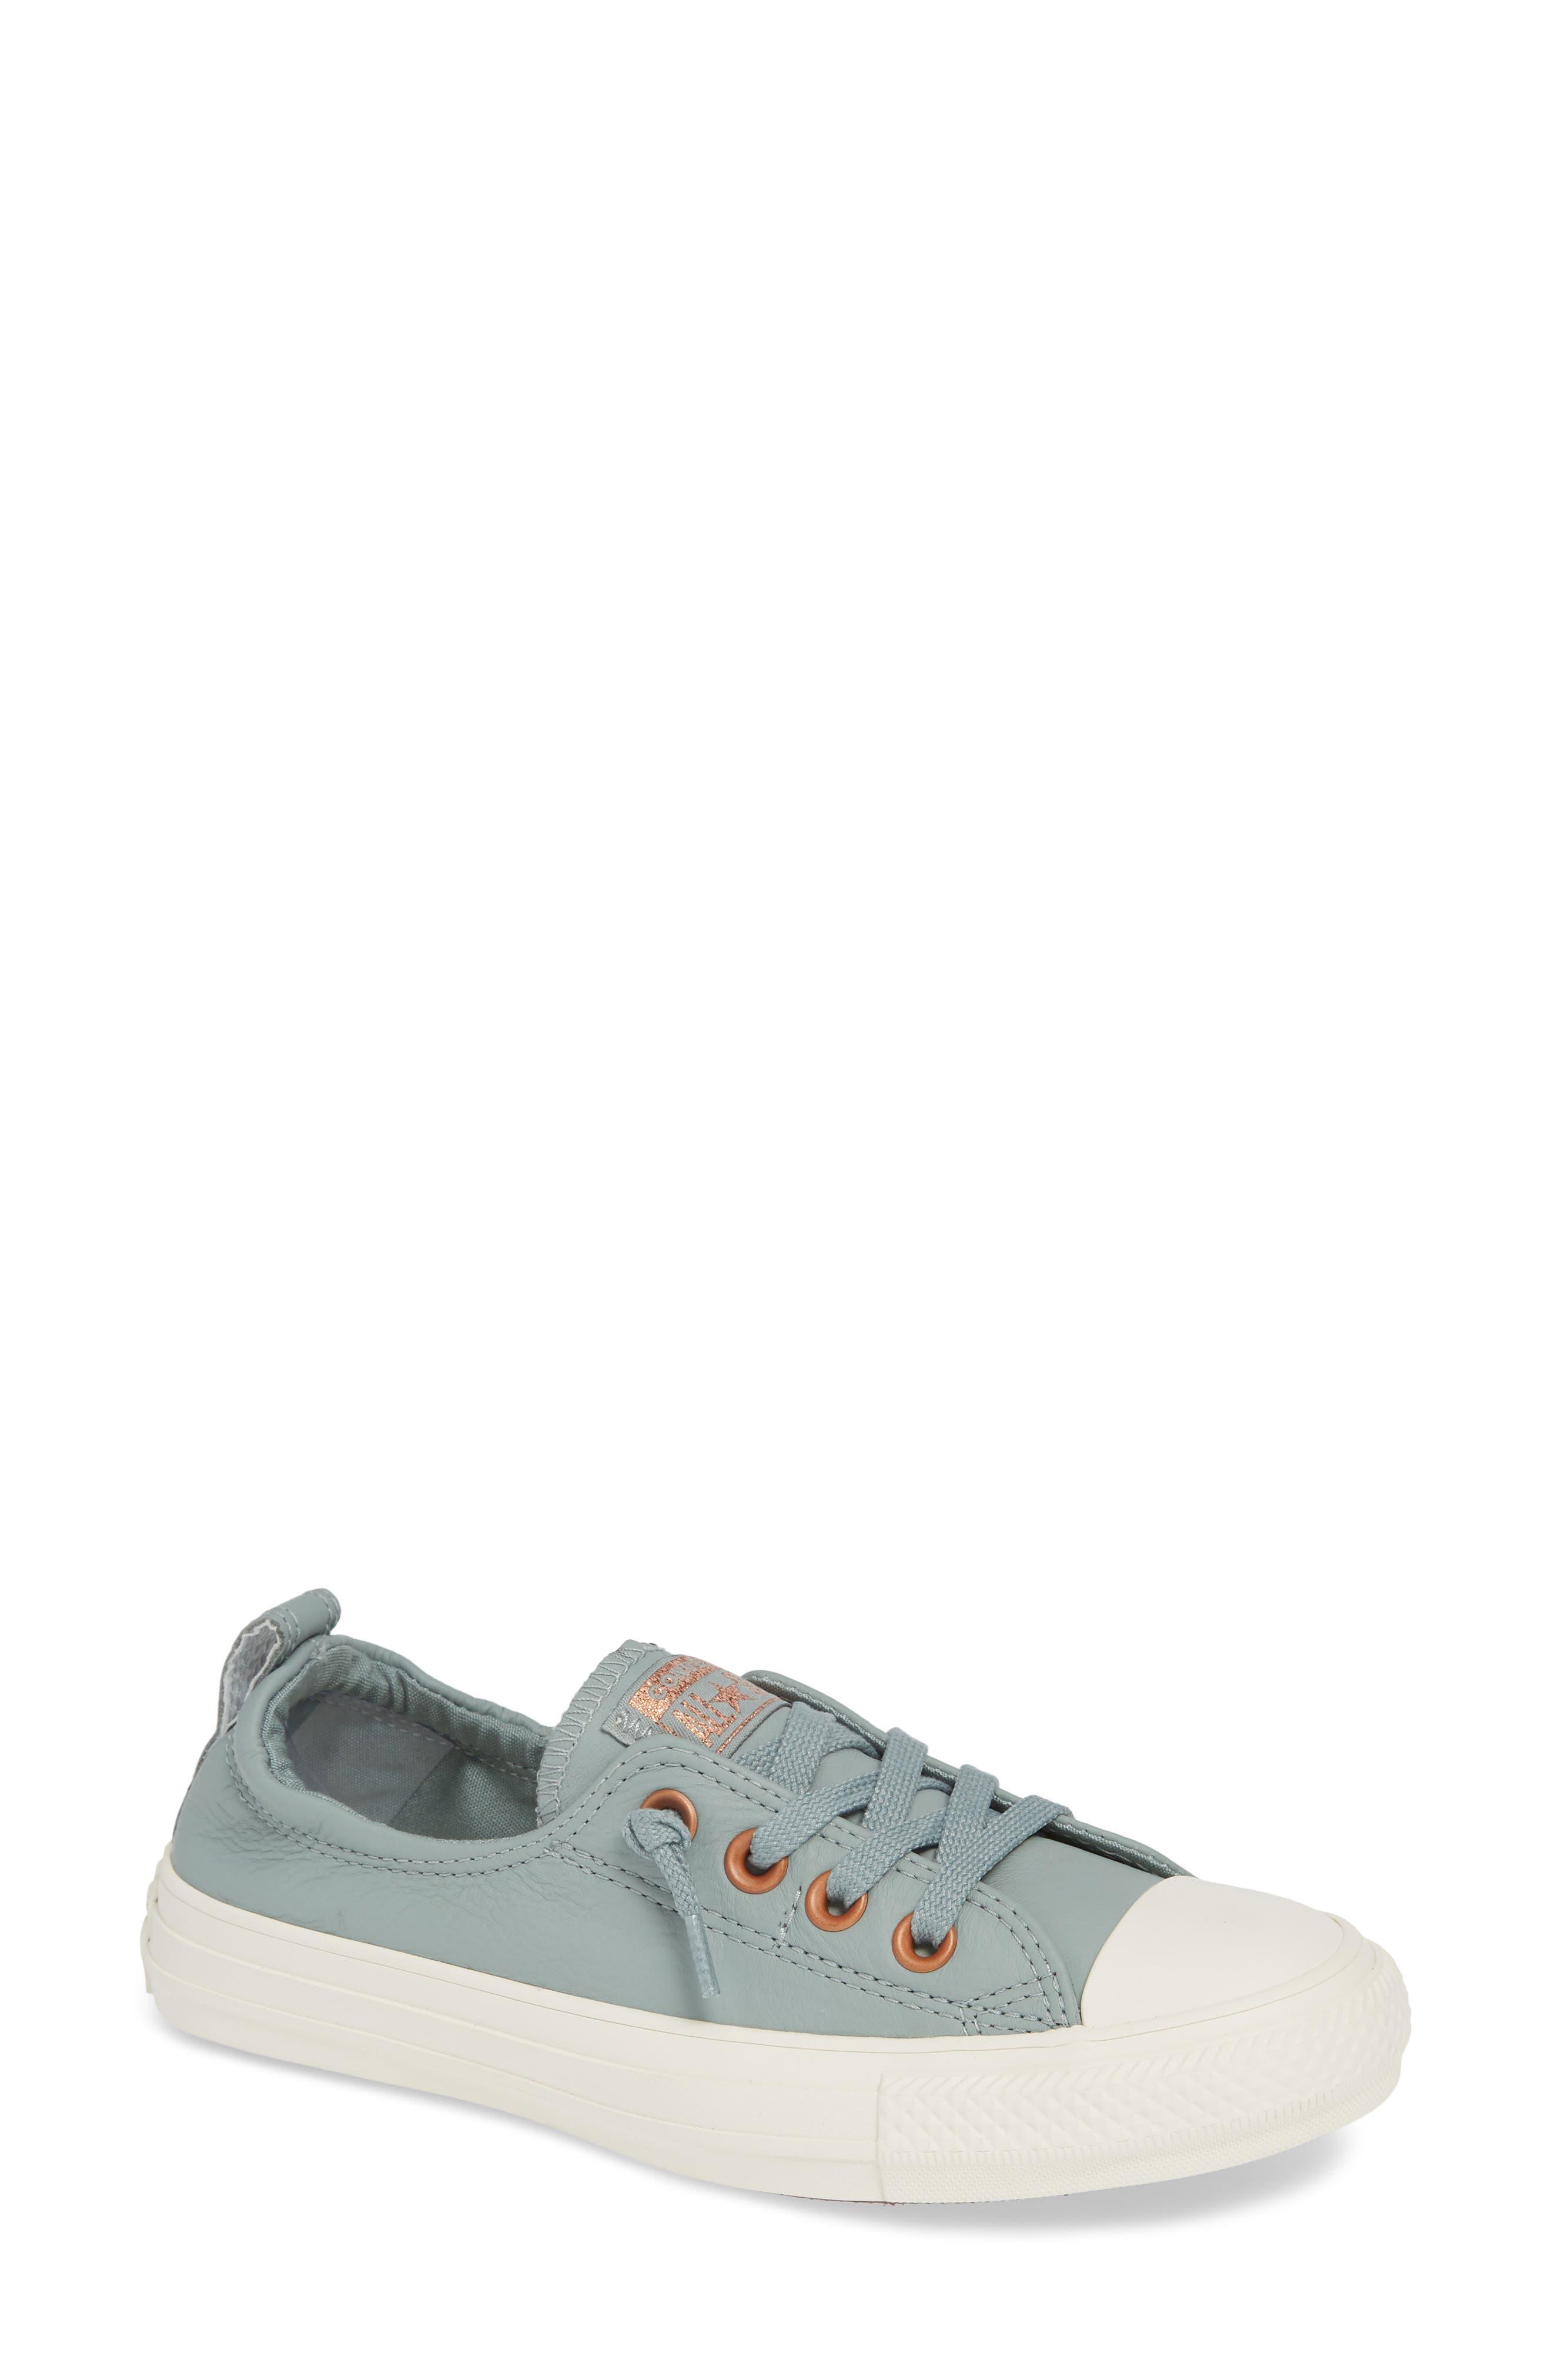 9df7ca730ba ... all star black 78ca7 fafb3 discount converse chuck taylor shoreline  sneaker women cddcc a781f inexpensive converse webshop ...